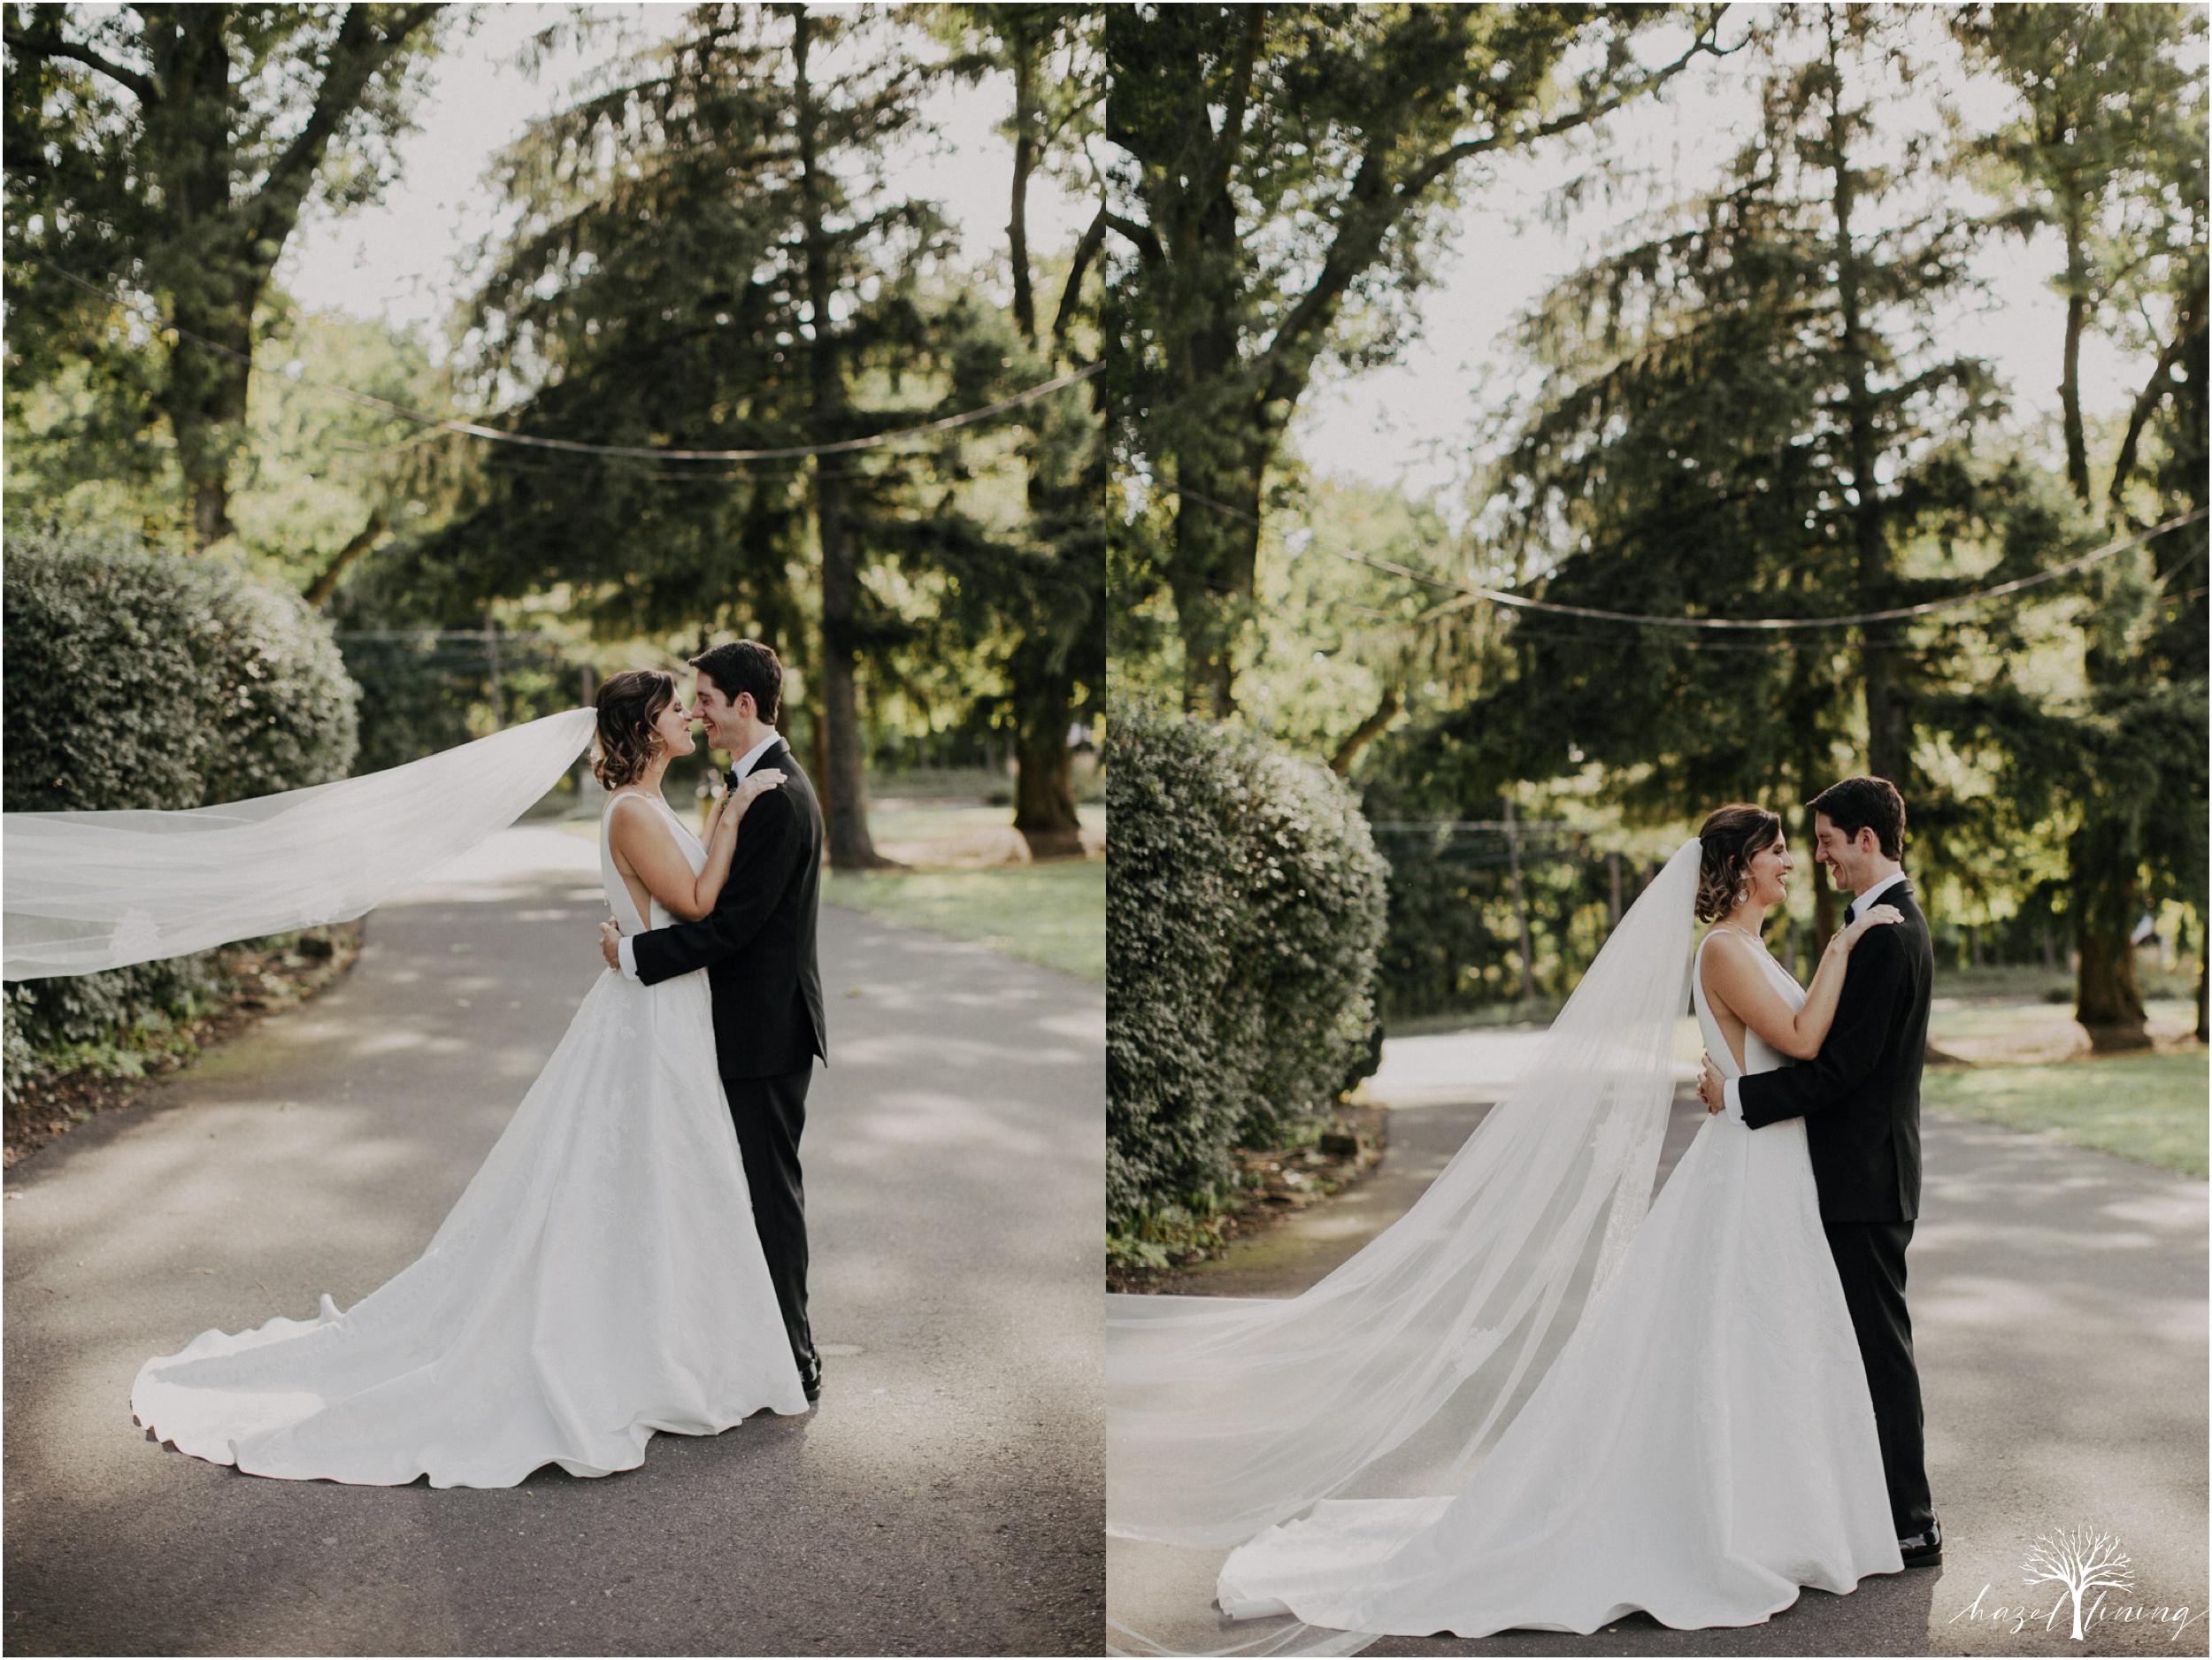 maureen-hepner-anthony-giordano-rose-bank-winery-newtow-pennsylvania-luxury-summer-wedding-hazel-lining-photography-destination-elopement-wedding-engagement-photography_0090.jpg